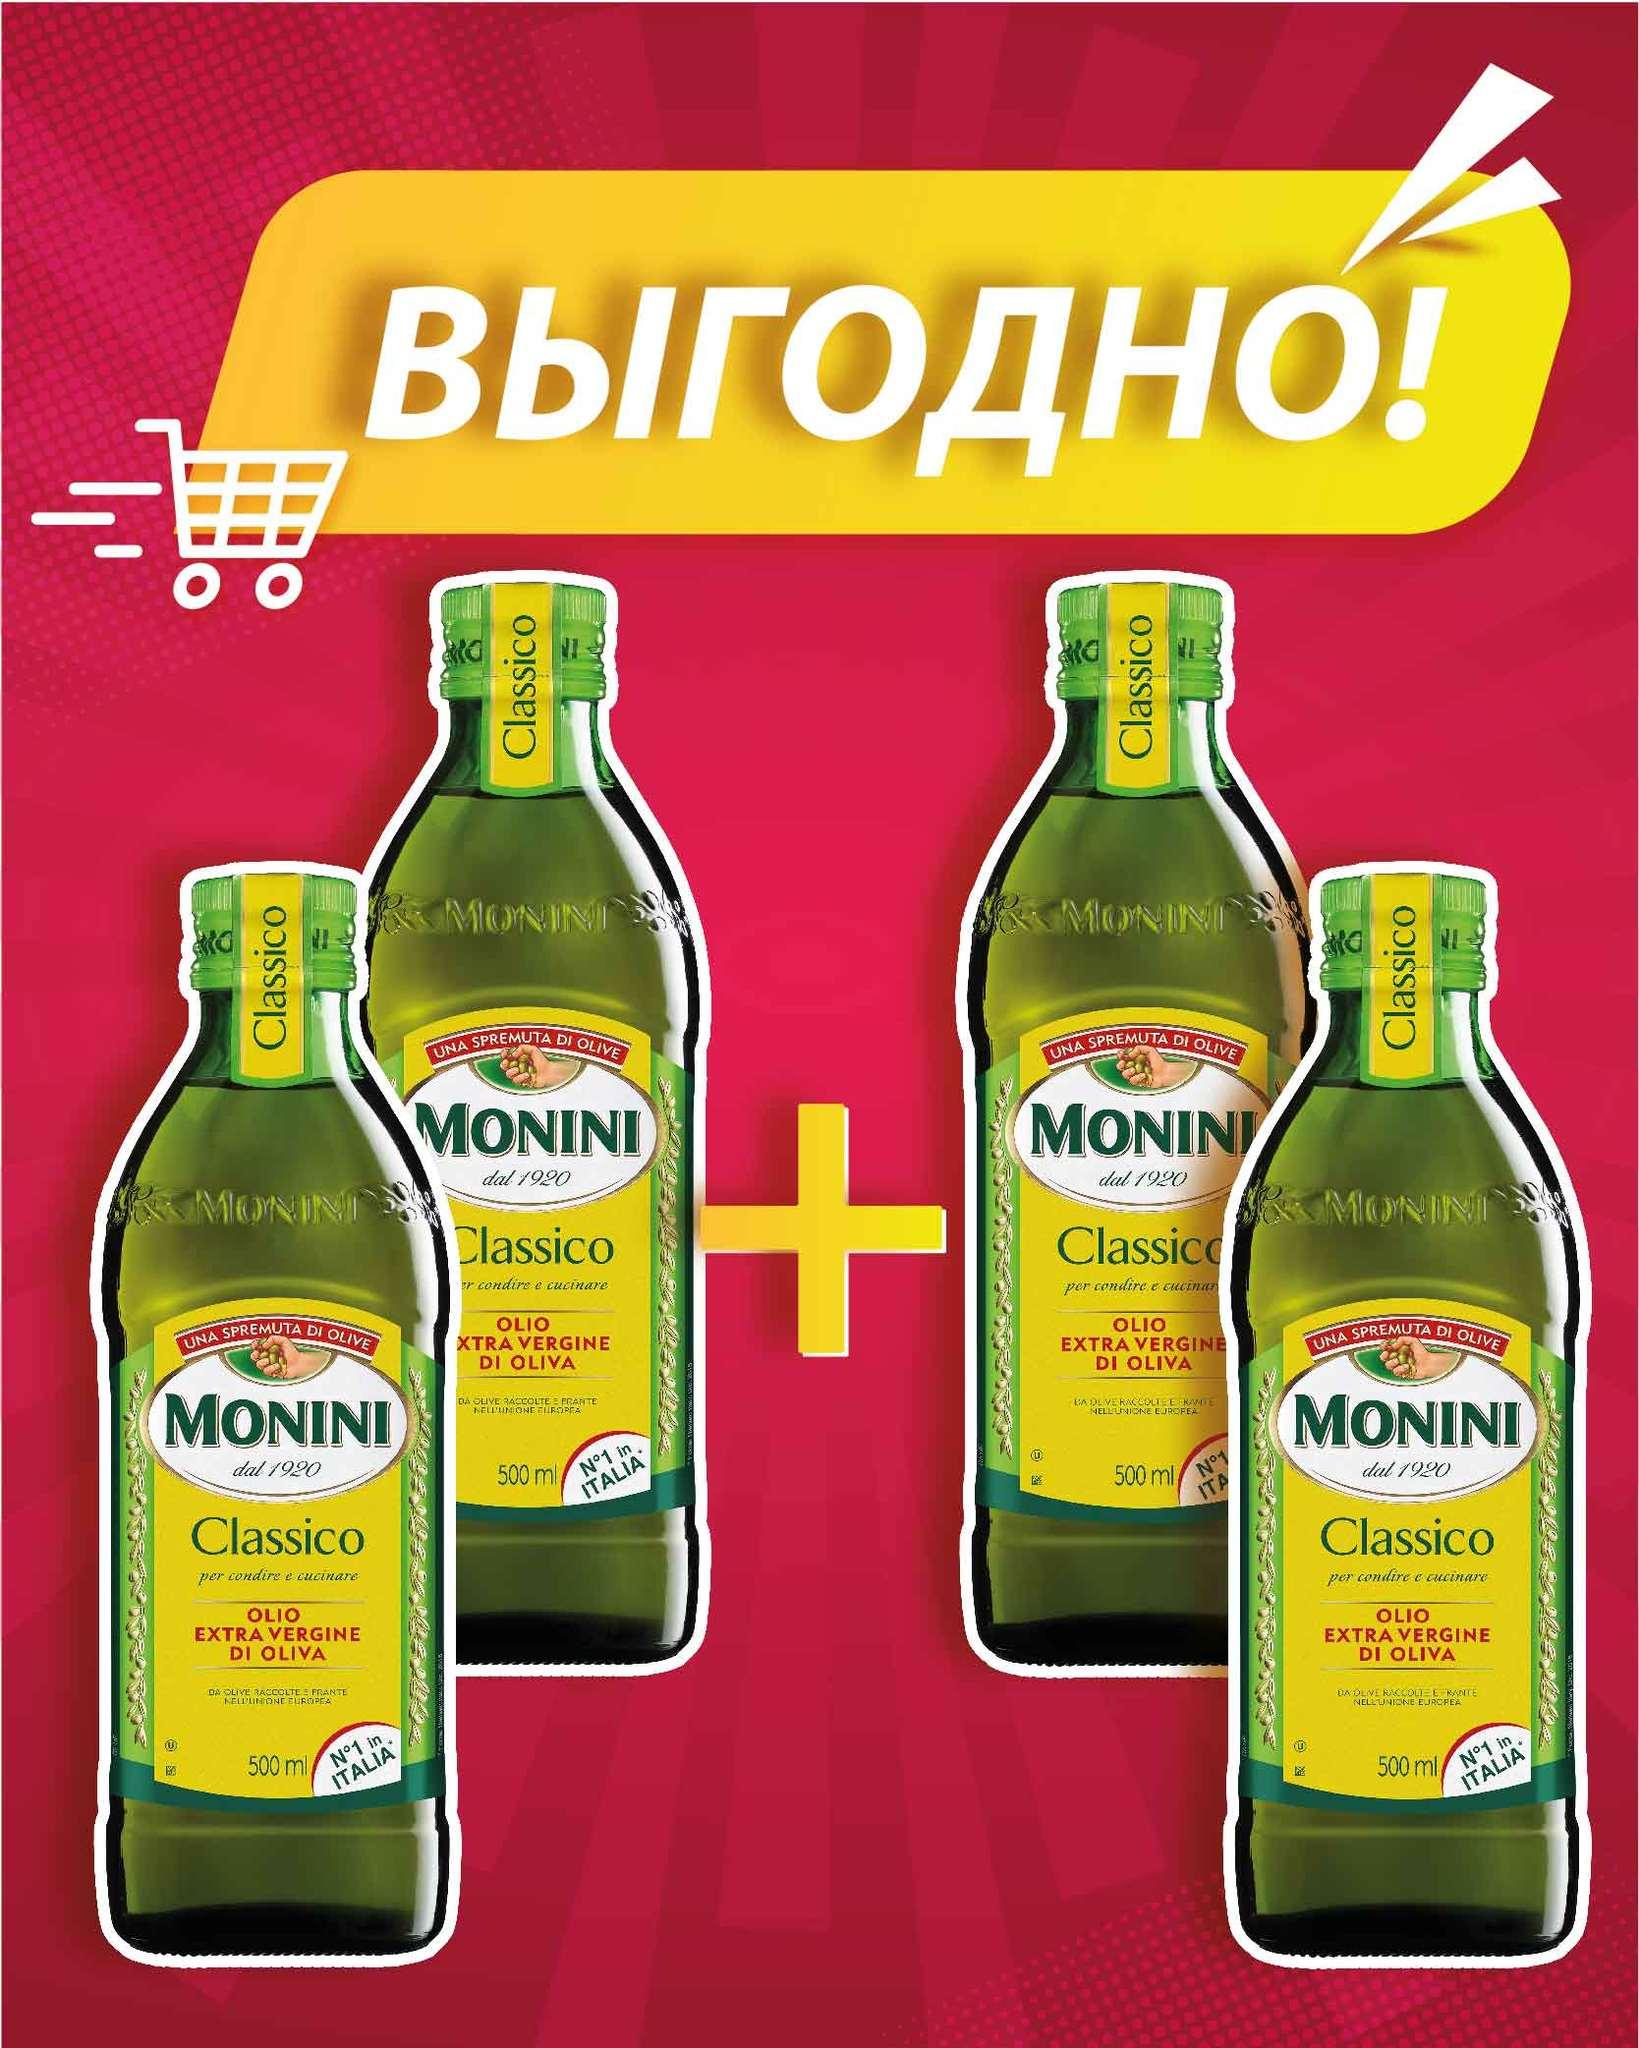 Набор Оливкового Масла Monini Экстра Вирджин Классико 0.5 л из 4 шт.